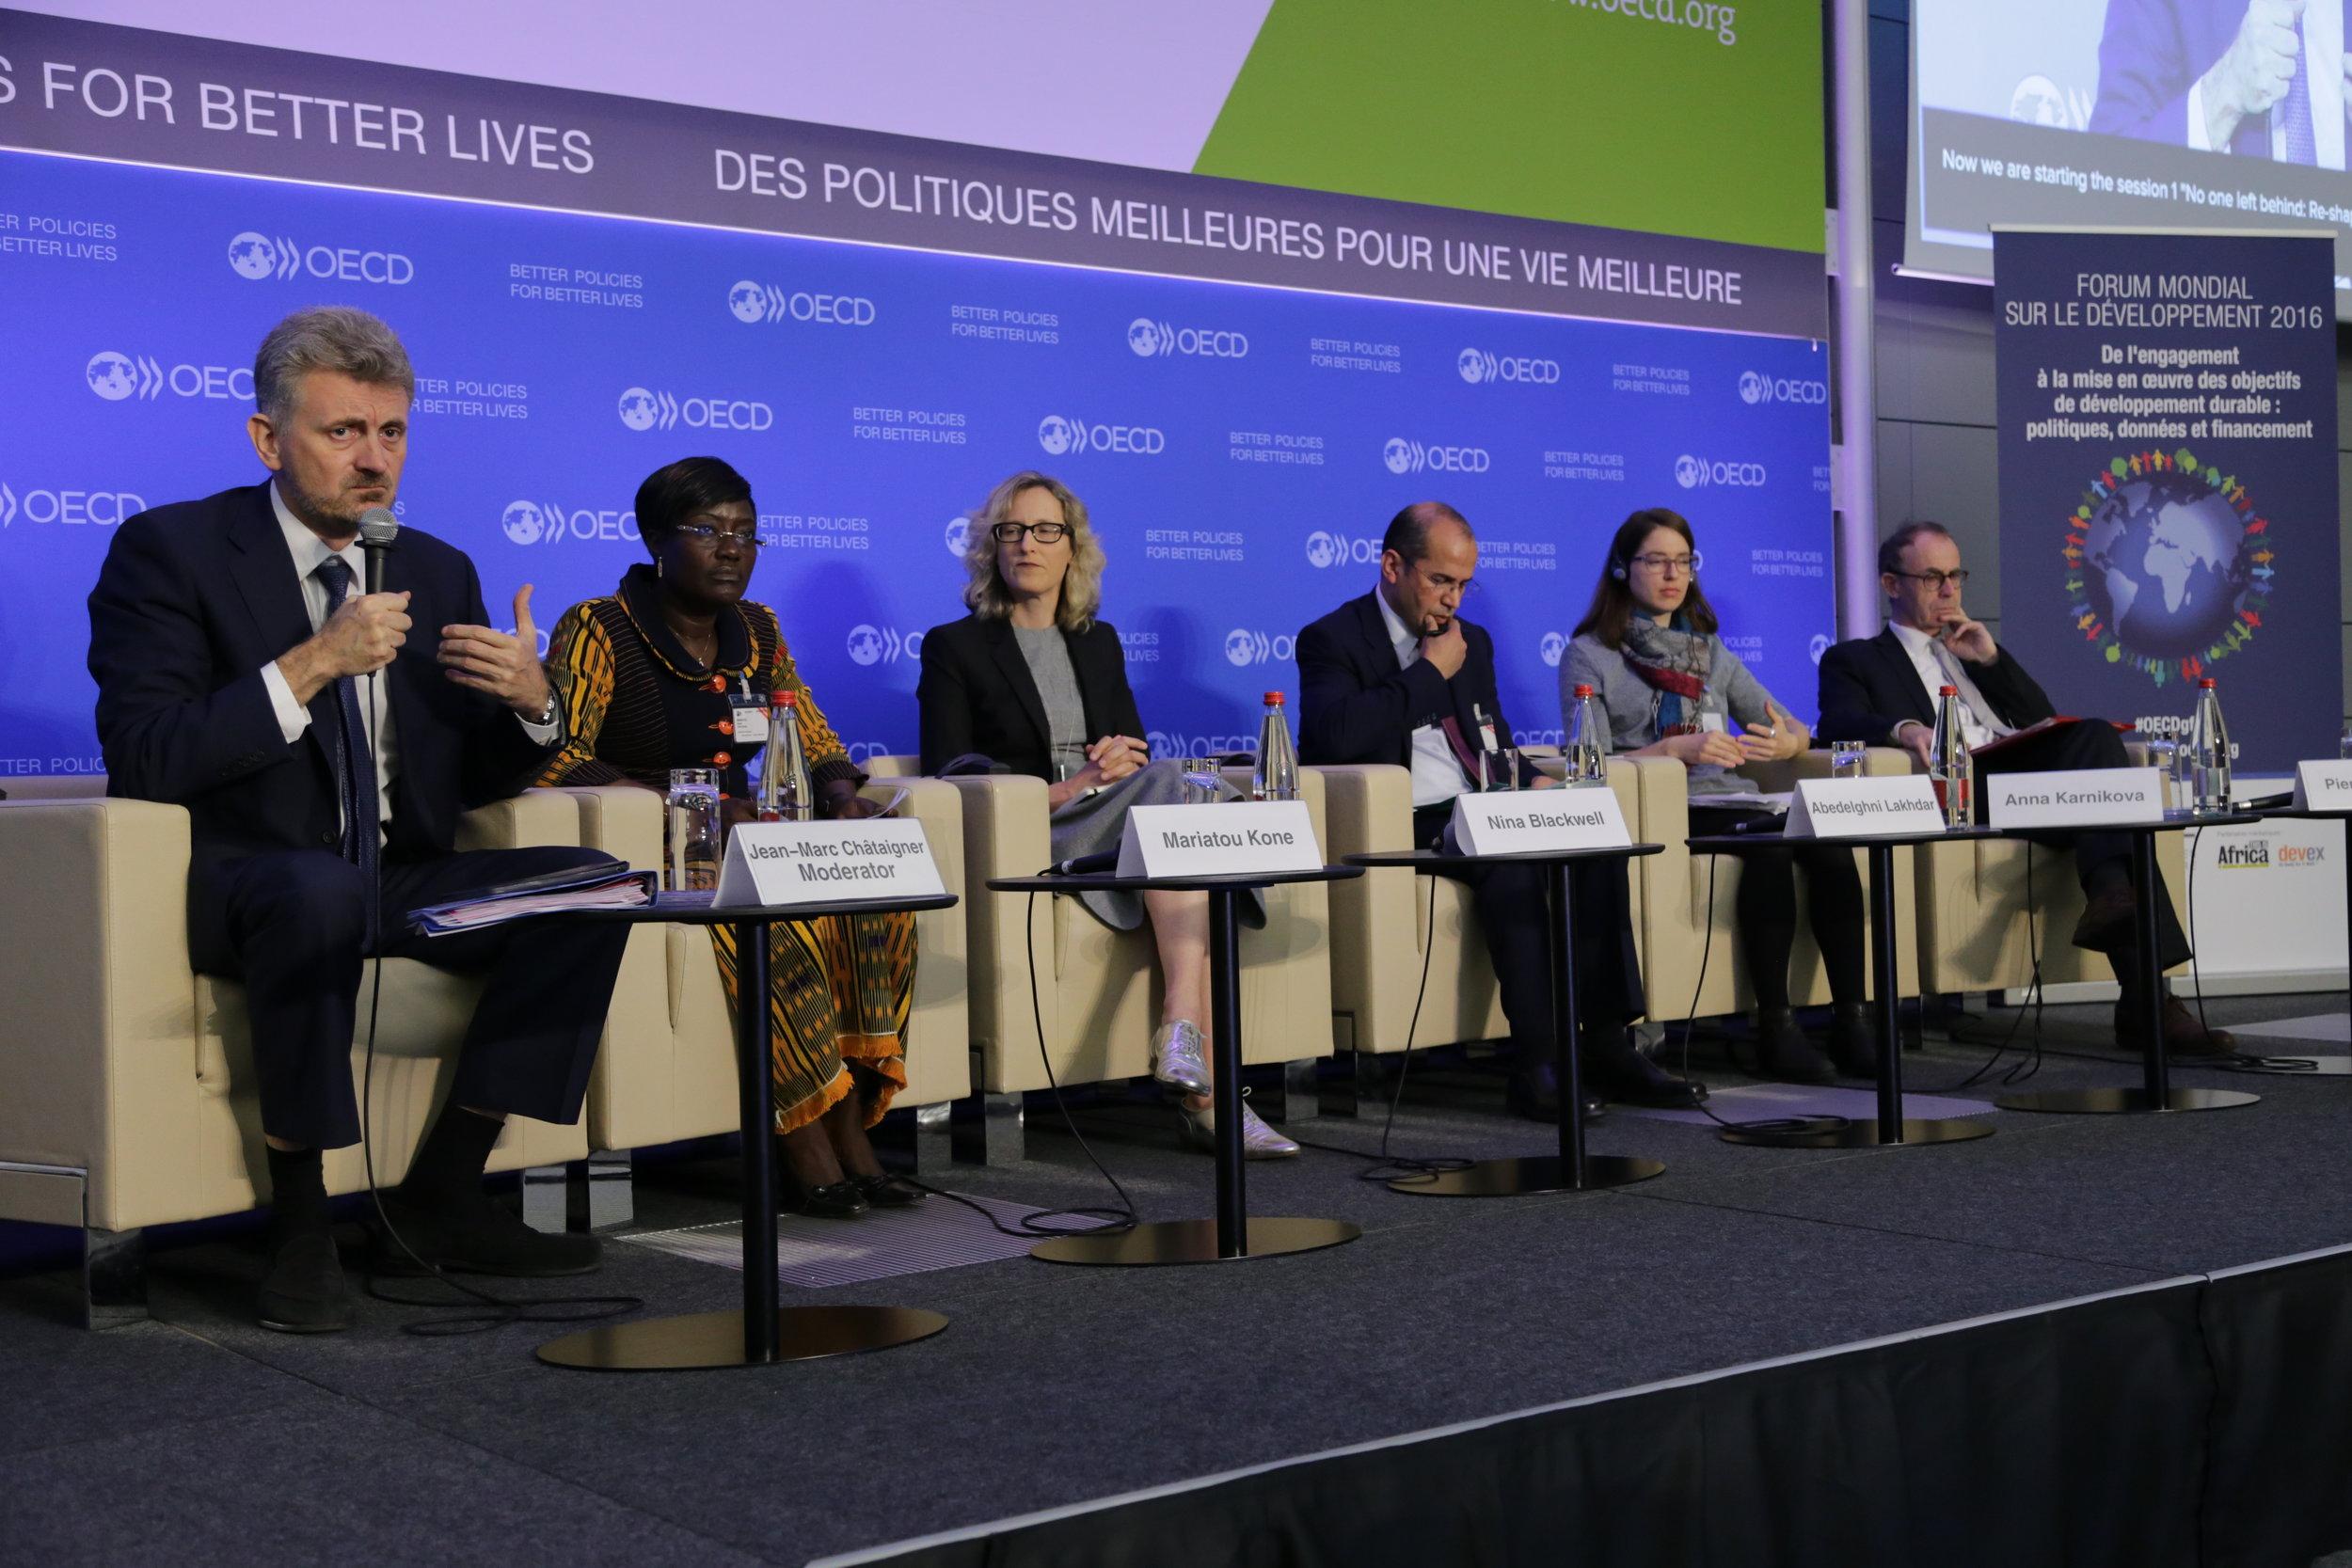 31 March 2016 The 2016 Global Forum on Development OECD Headquarters, Paris, France Photo: OECD/Andrew Wheeler